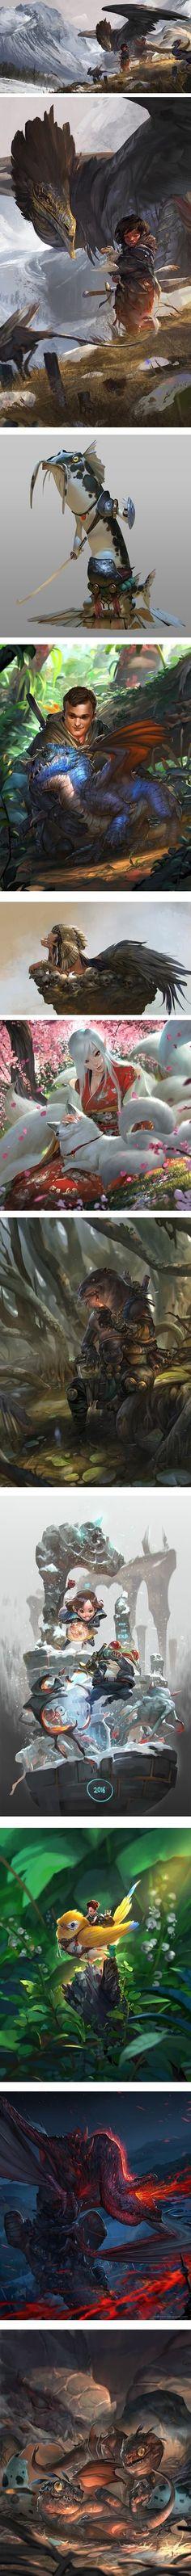 Monster Concept Art, Fantasy Monster, Fantasy Creatures, Mythical Creatures, Fantasy Illustration, Art Illustrations, Dragons, Fantasy Artwork, Fantasy Images